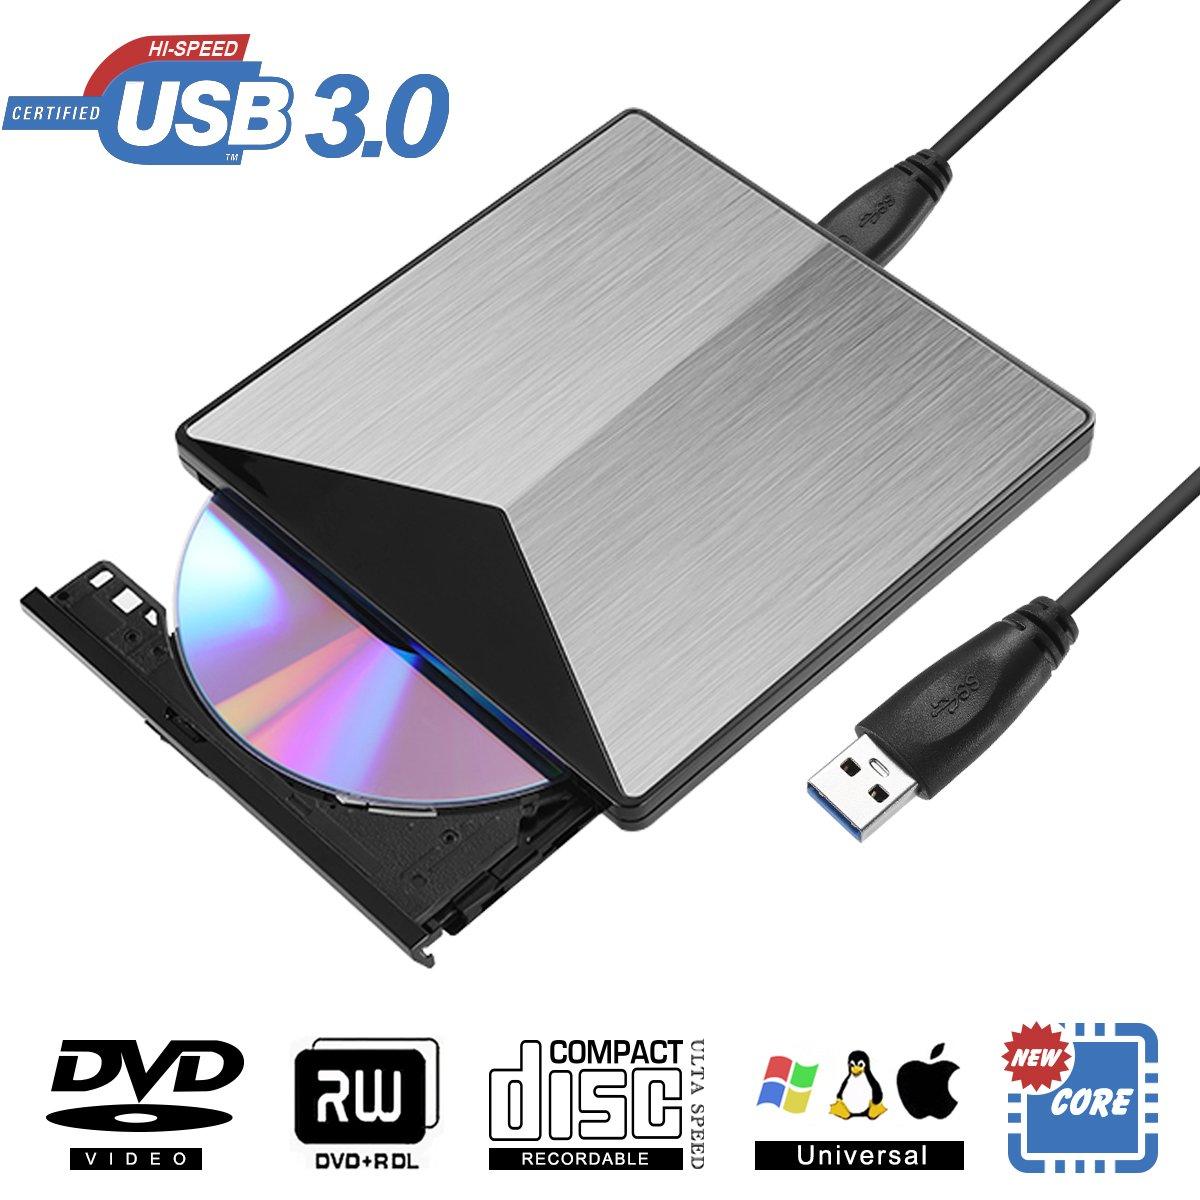 External DVD Drive, BOSLISA USB 3.0 DVD CD Burner, CD-RW Player, Optical DVD Superdrive High Speed Data Transfer for Laptop Air iMac Desktop PC Support Windows10 /8/7 /XP/Mac OS (Silver) (Silver)